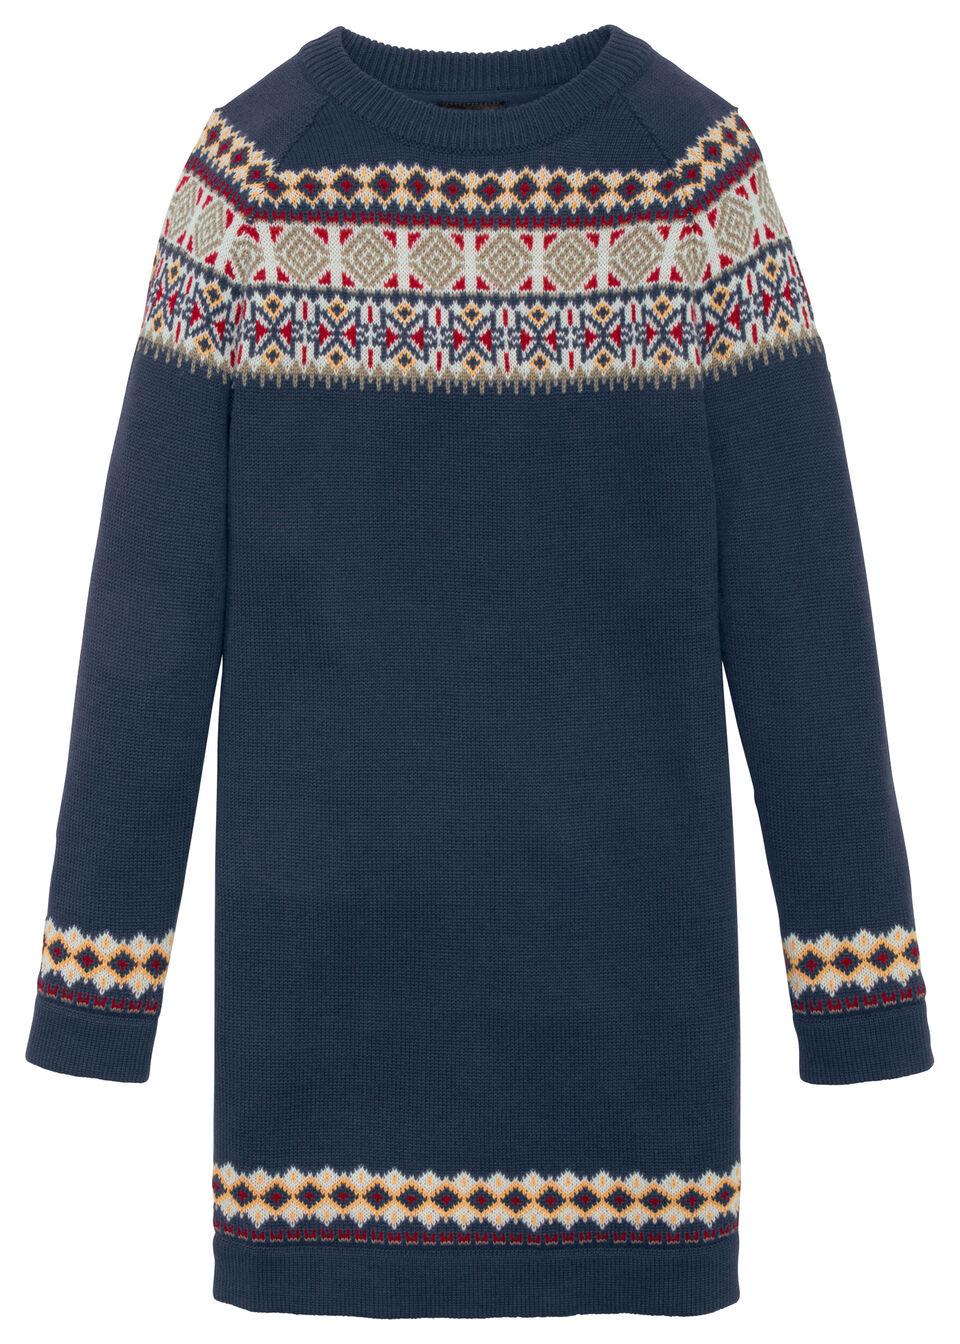 Rochie tricotată cu model norvegian bonprix